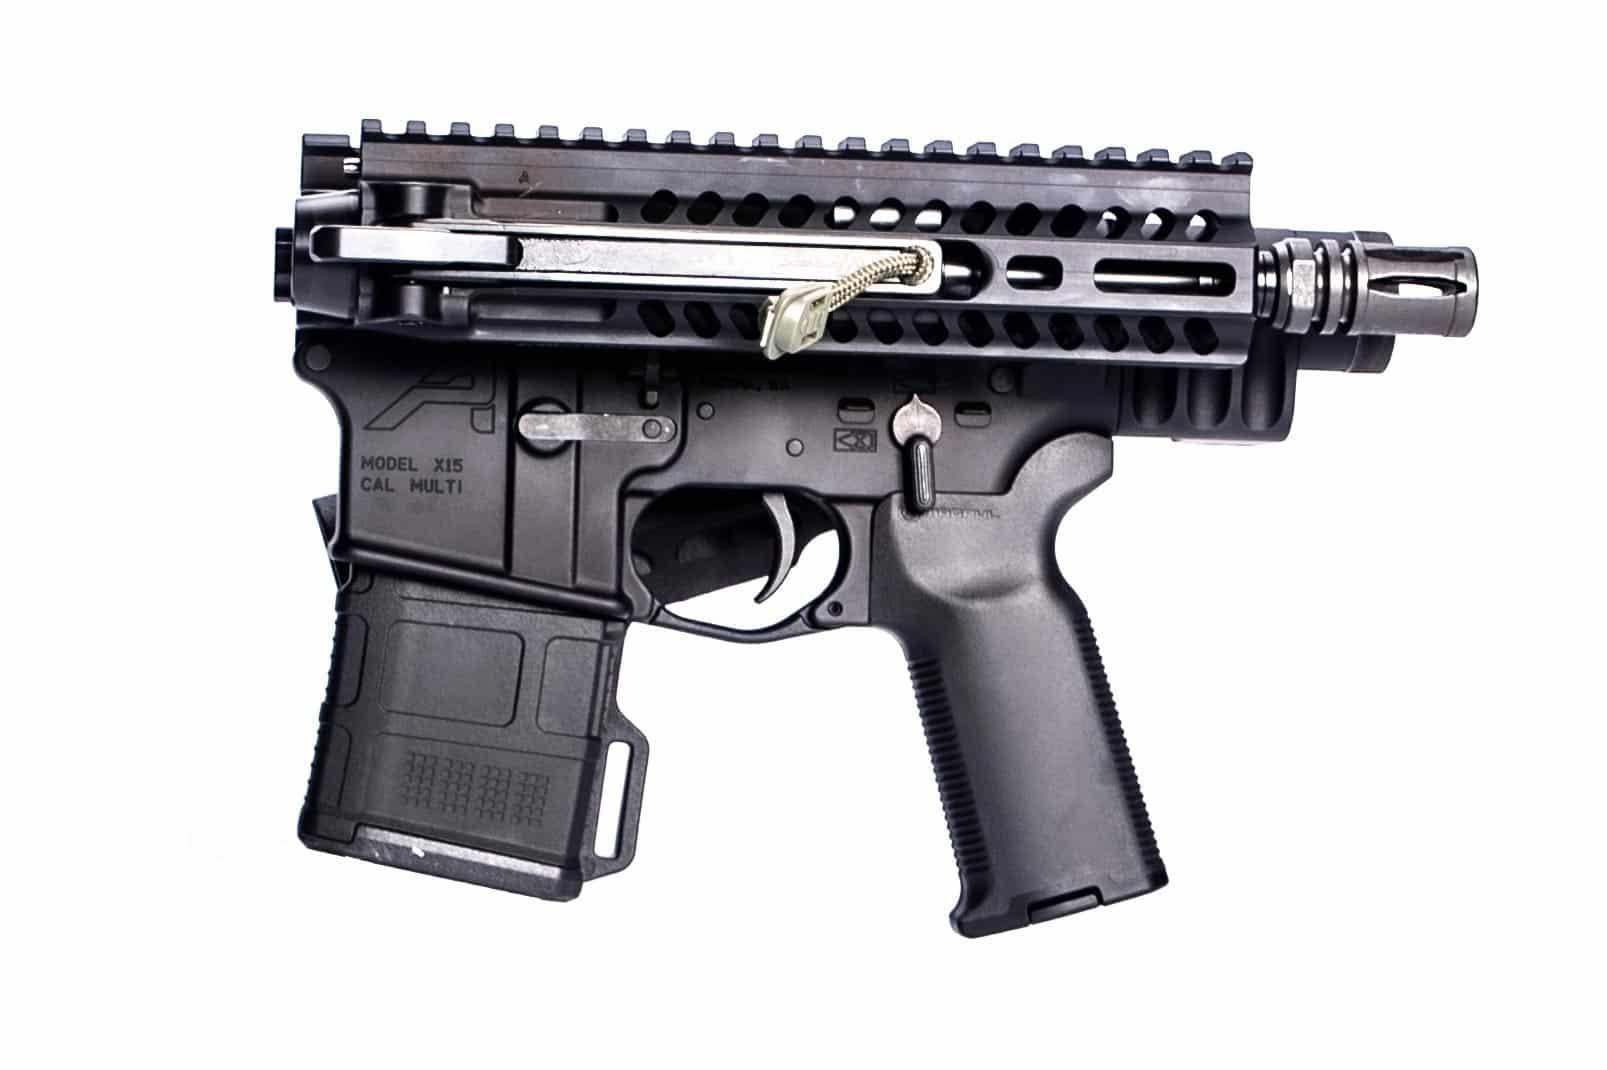 "FOLDAR FOLDING AR15 UPPER 9"" .223 WYLDE BARREL WITH FOLDAR PISTOL BRACE AND DEAD FOOT ARMS MCS SYSTEM"